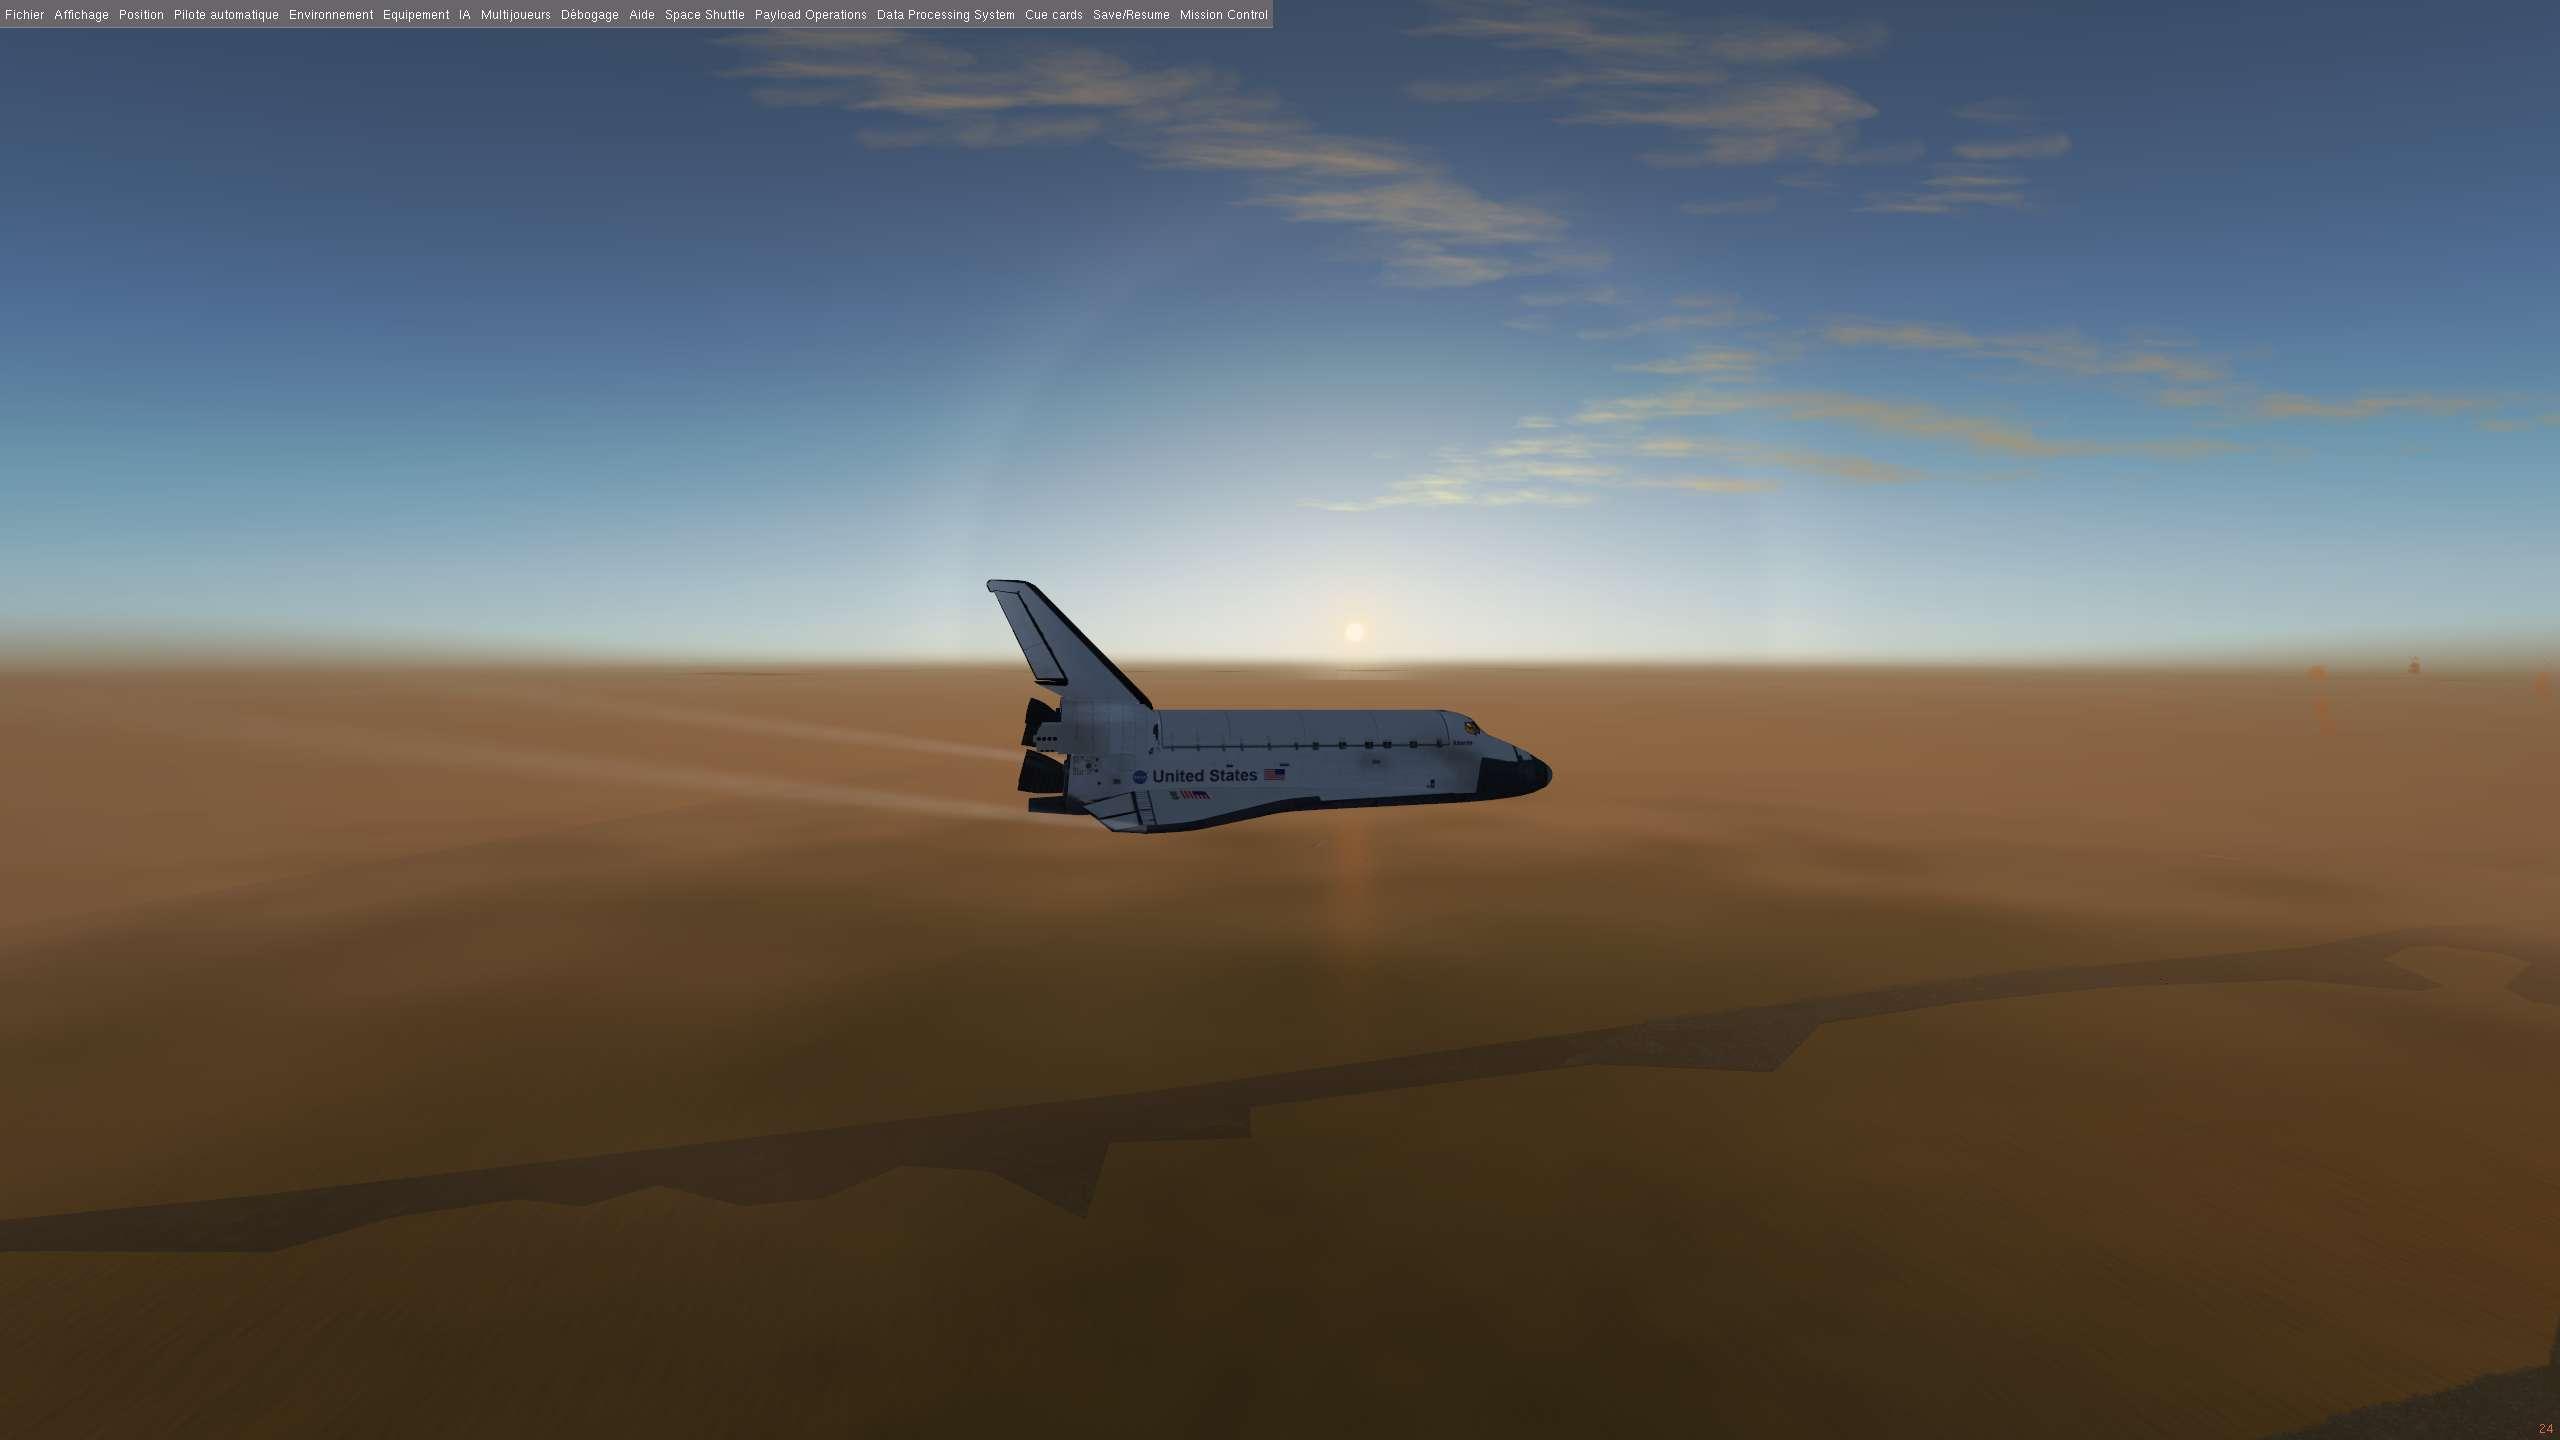 land the space shuttle simulator - photo #29